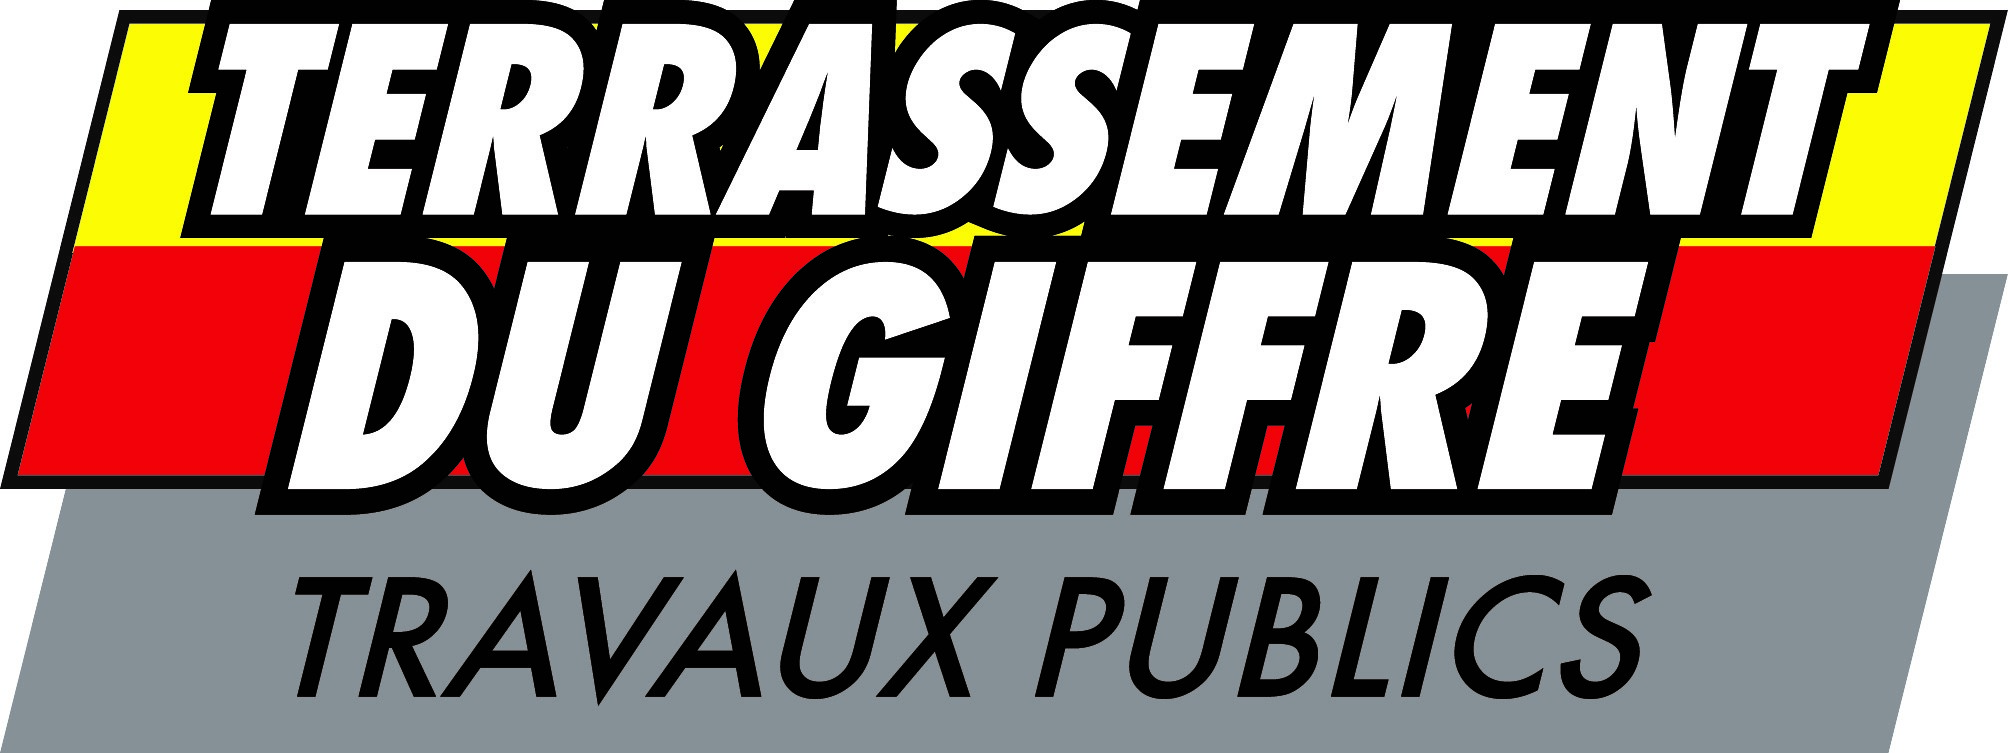 Terrassement giffre 2016 -1-